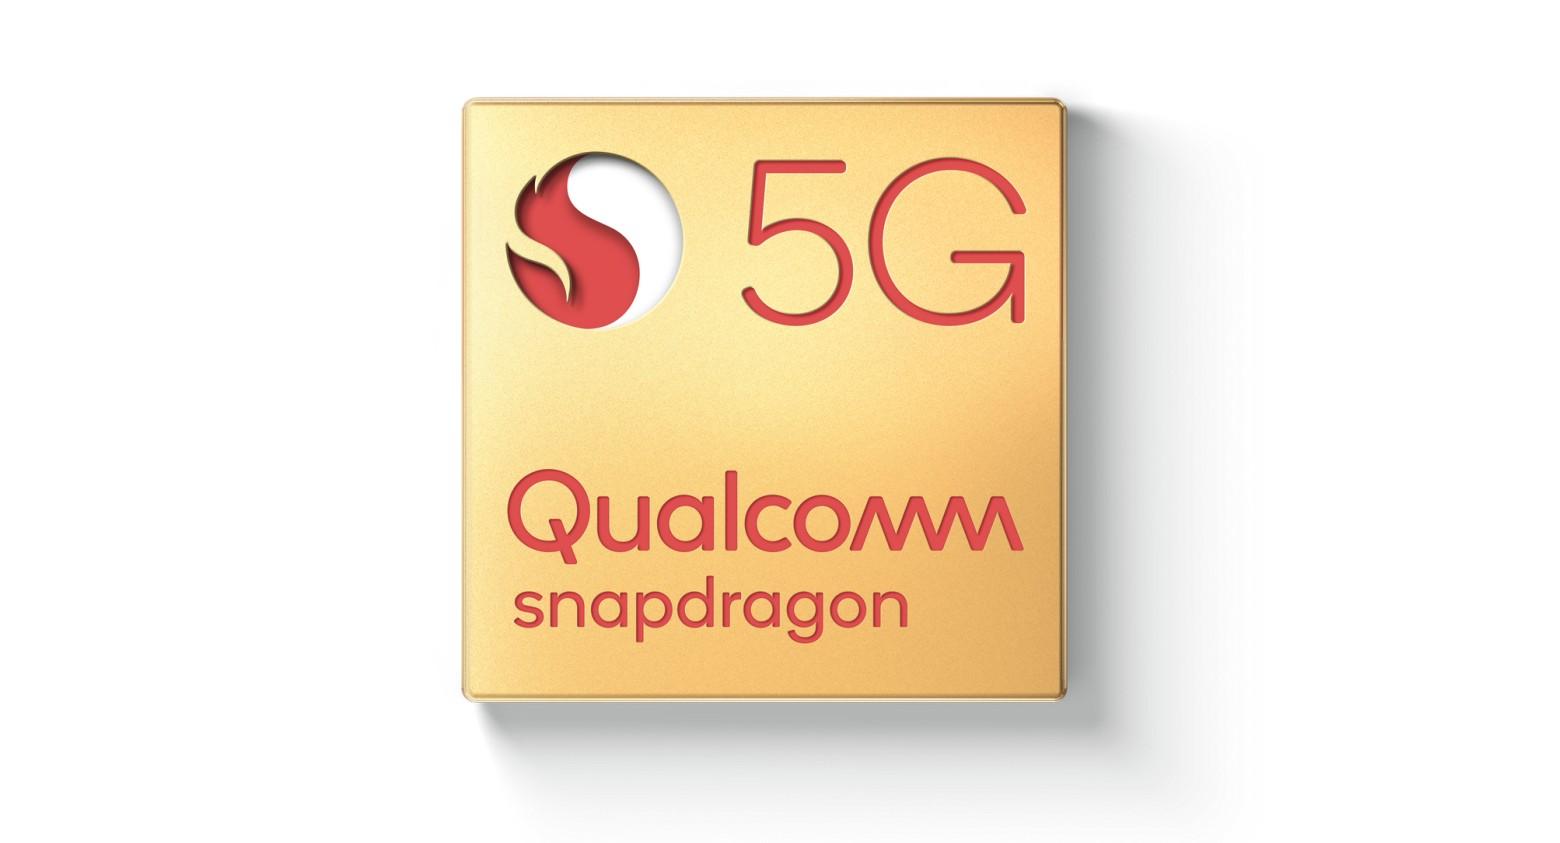 Qualcomm представила платформу Snapdragon 855 с поддержкой 5G - 4